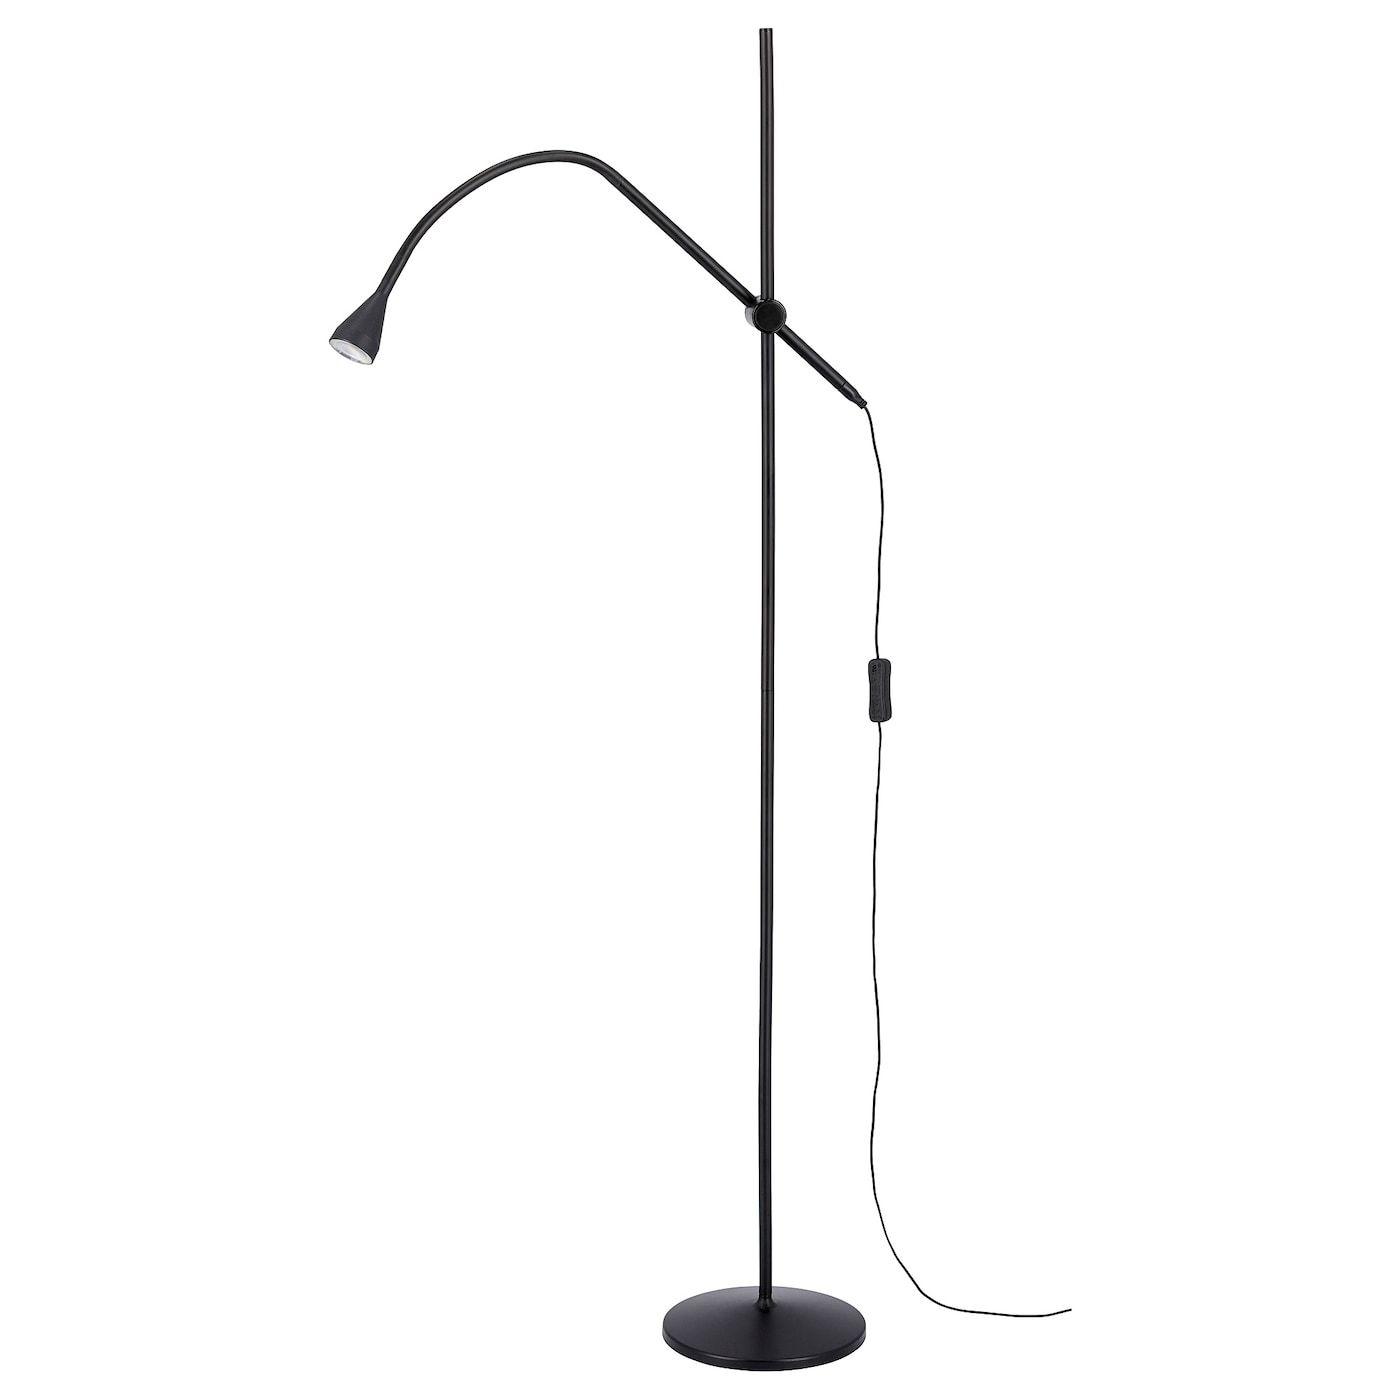 Ikea Stand Leseleuchte Led In 2020 Led Led Leuchtmittel Gluhlampe